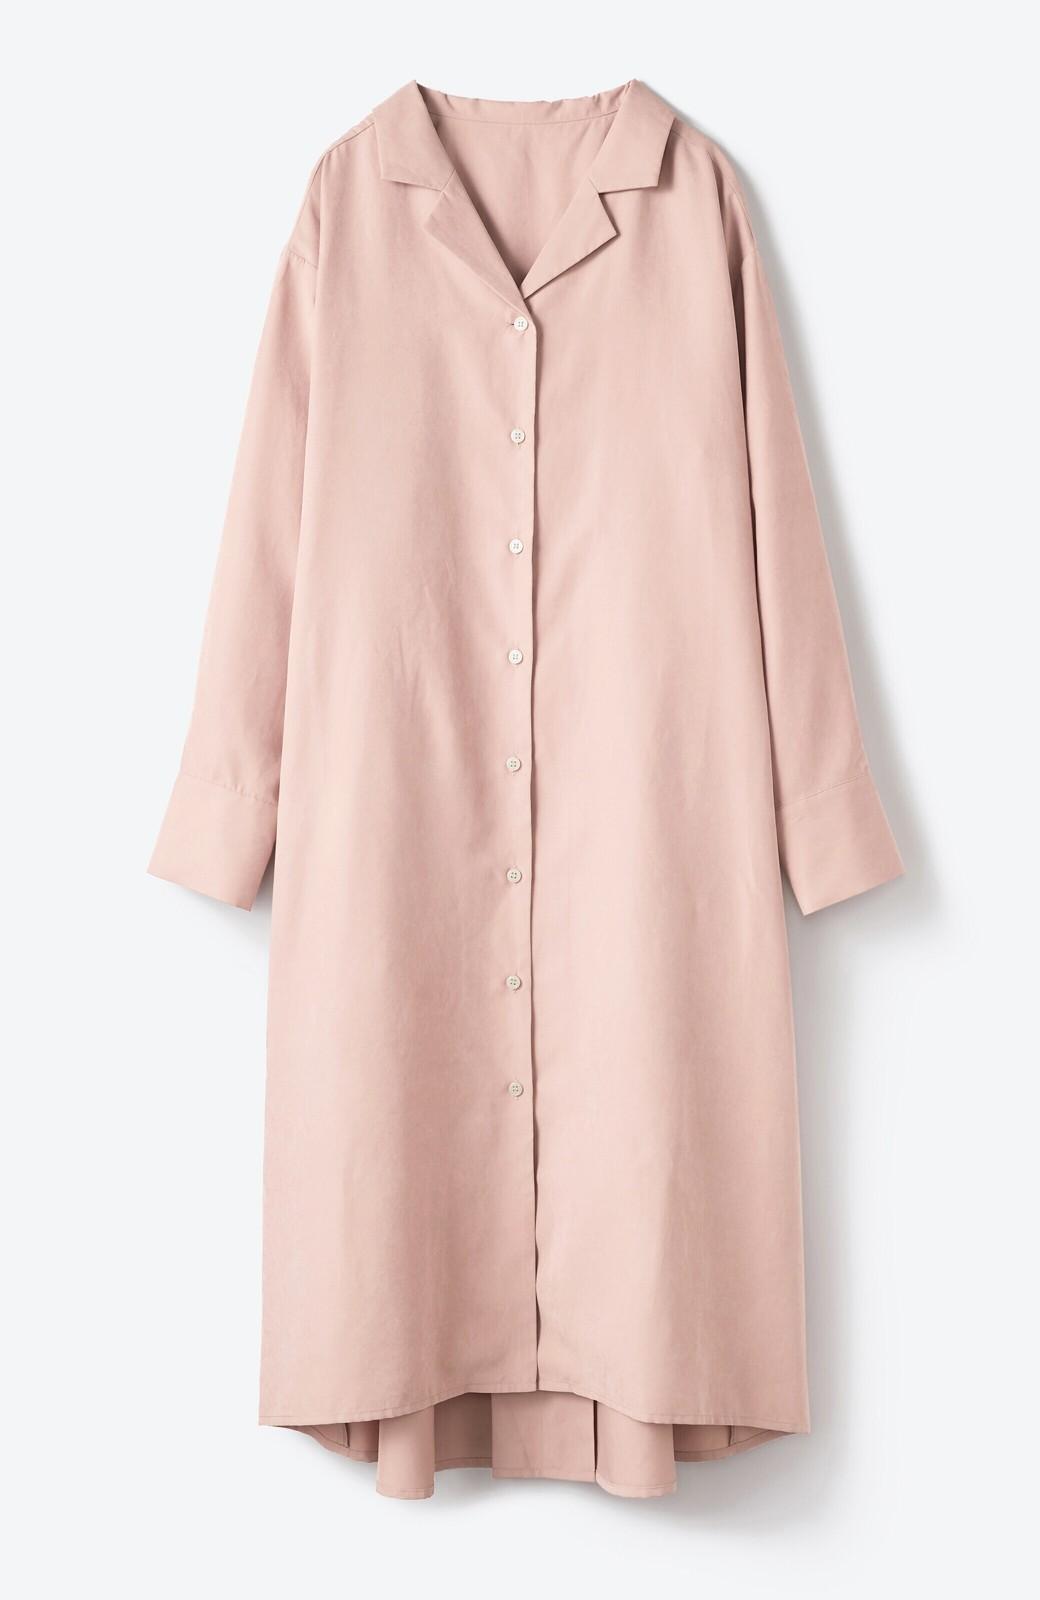 haco! 太ってもばれずに羽織っても便利なAラインワンピース <ピンク>の商品写真19